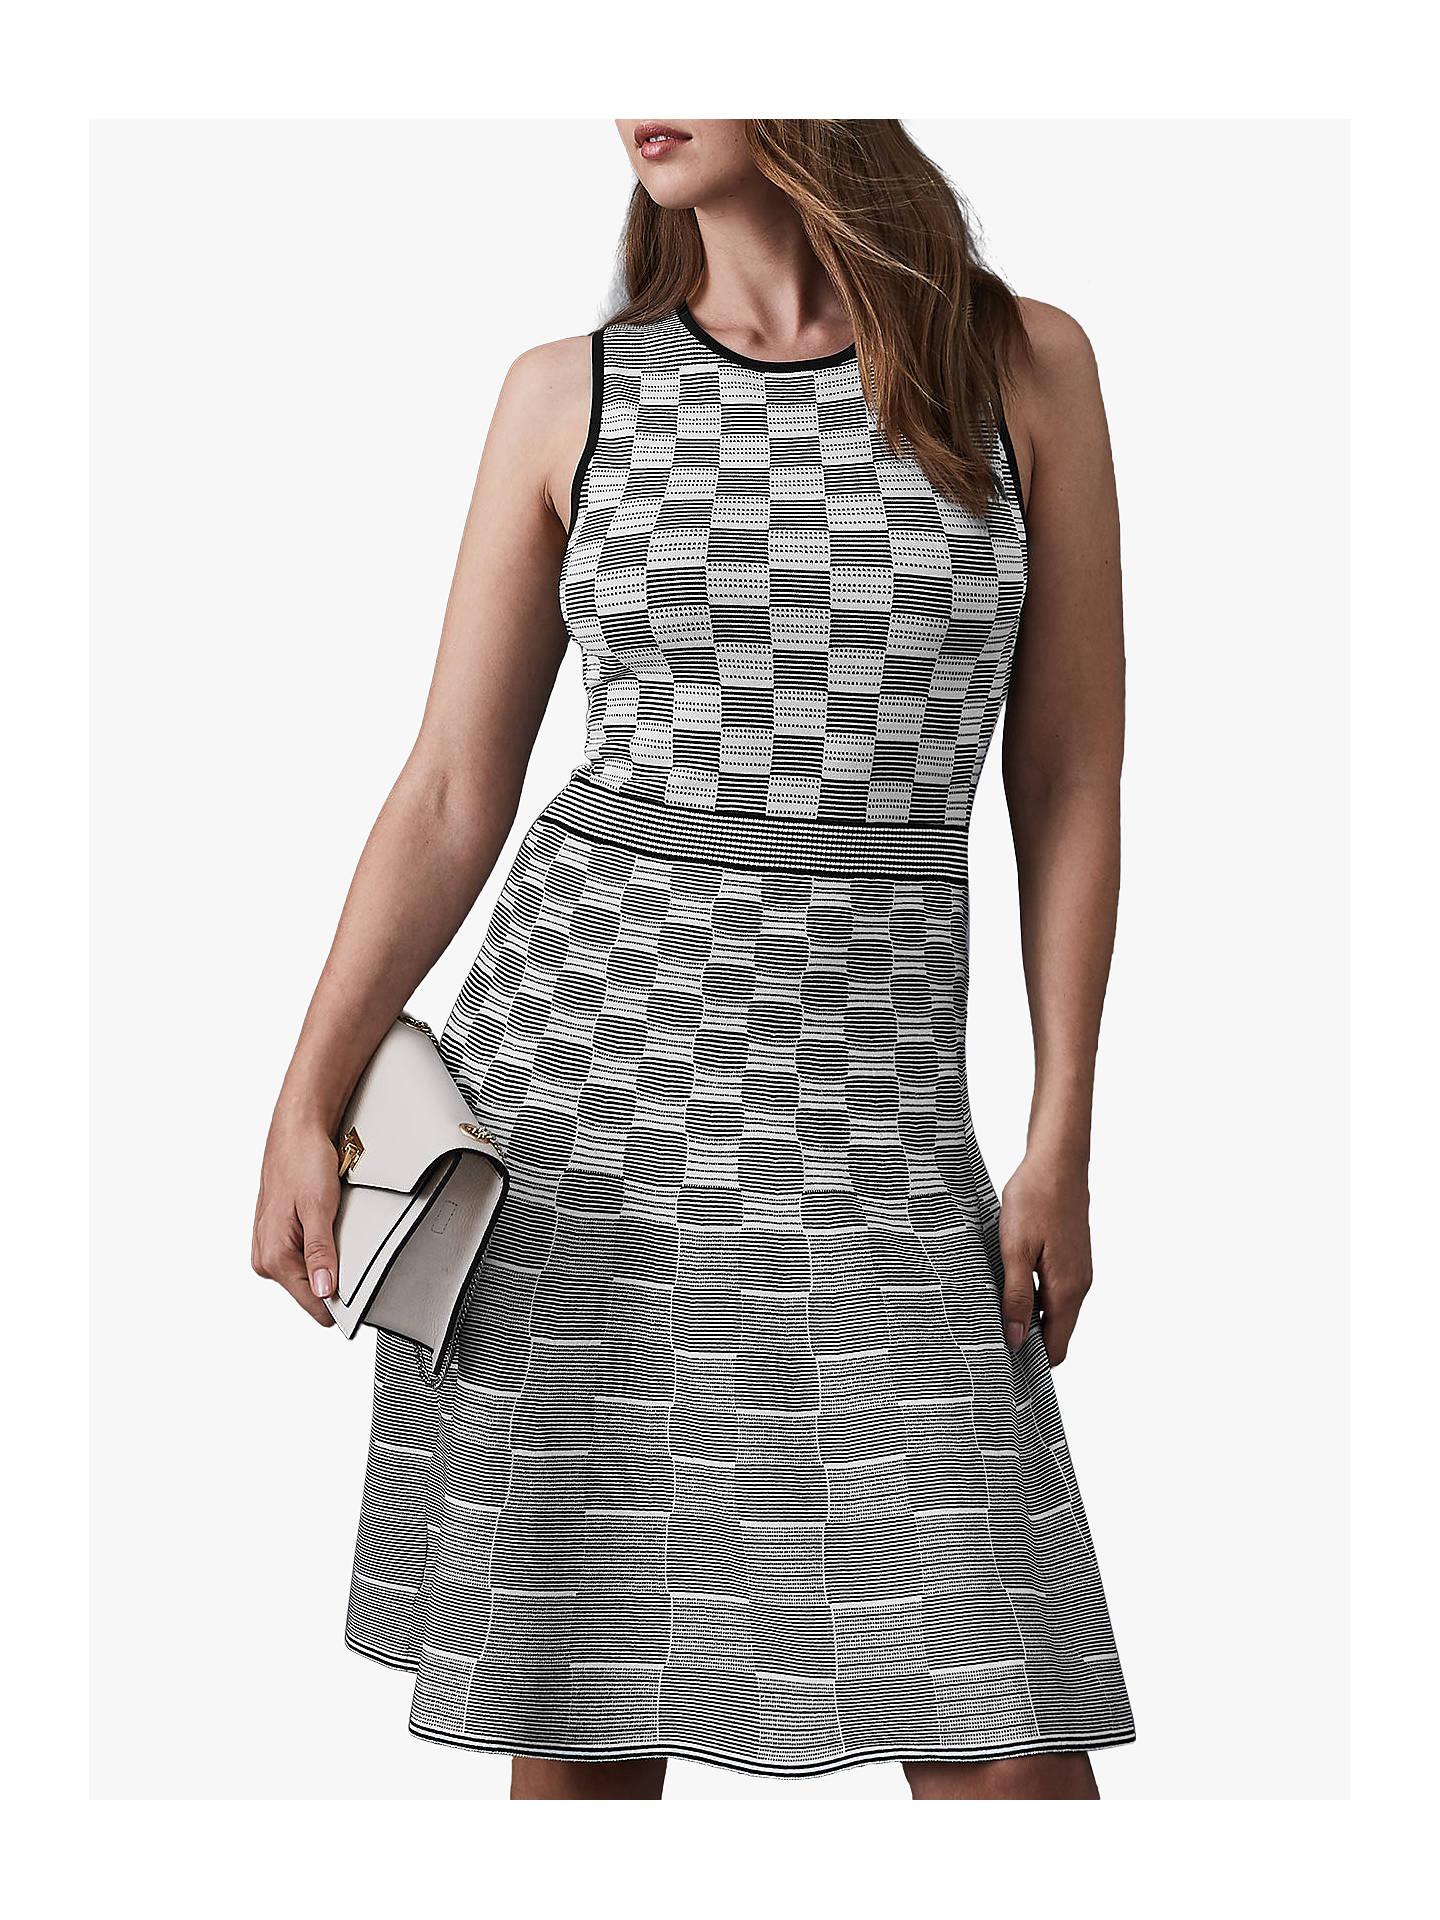 5f700fa8c8 BuyReiss Cassie Graph Jacquard Dress